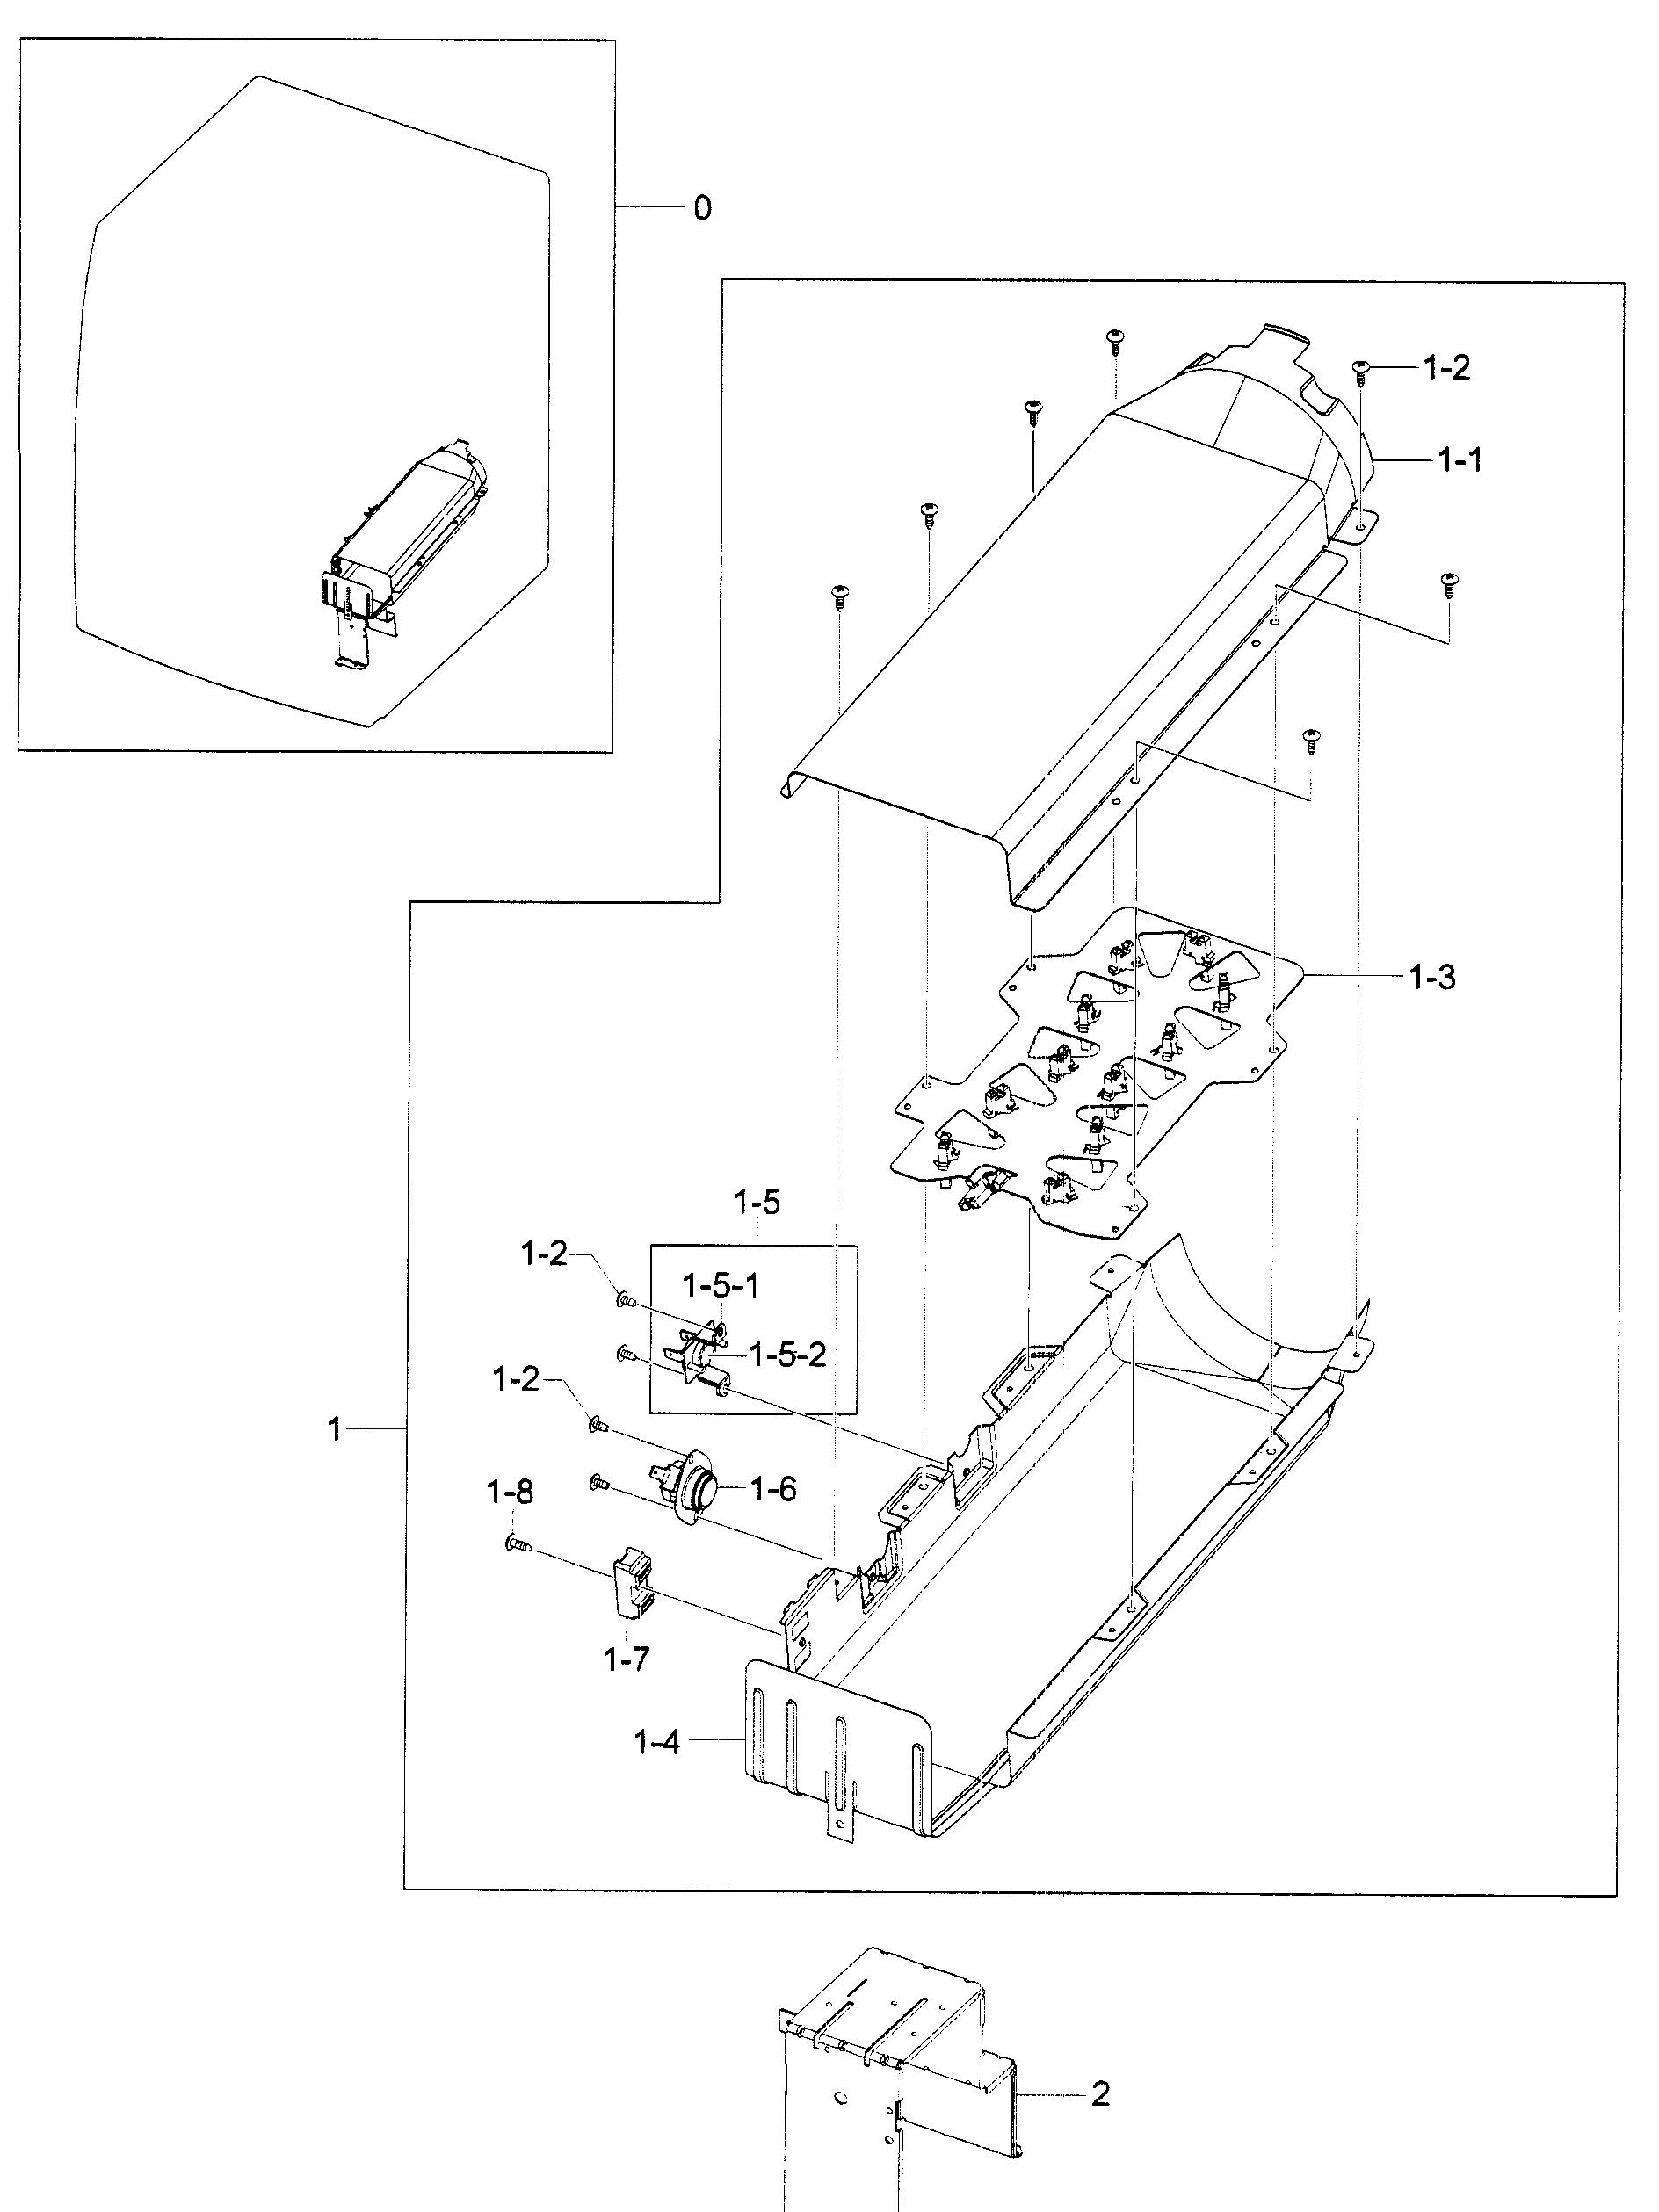 Samsung Dv210aew/xaa Wiring Diagram